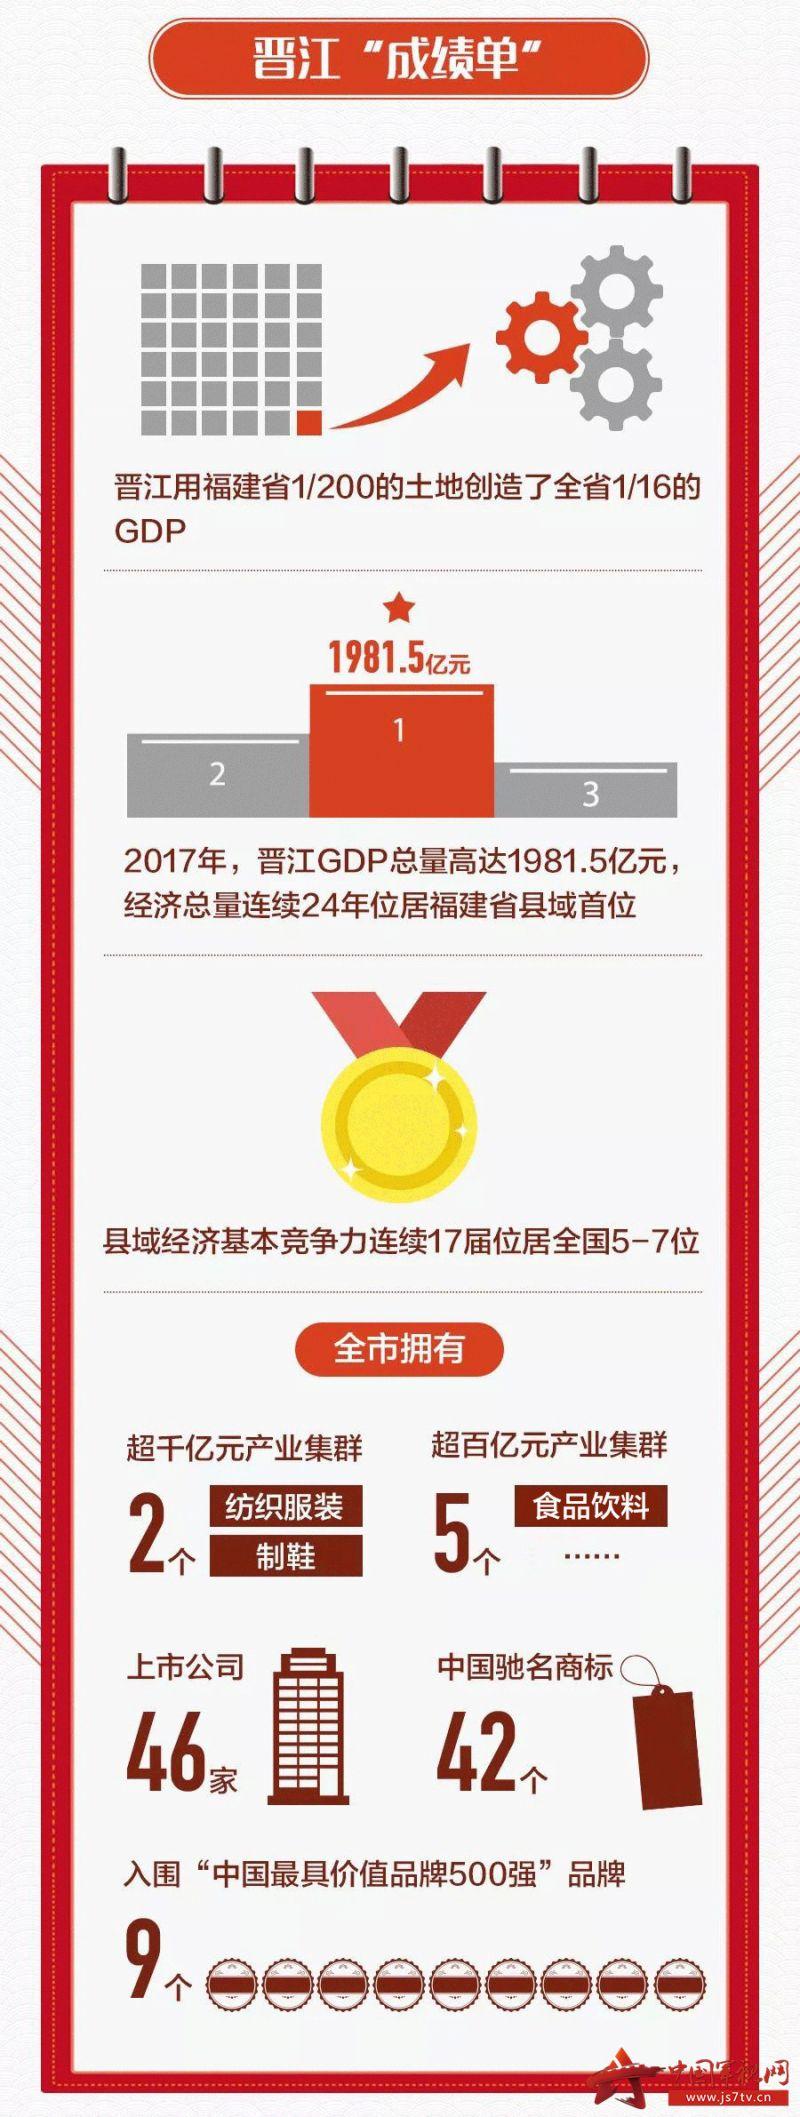 http://files.js7tv.cn/www/images/2018-07/12/1531364974489145_big.jpg